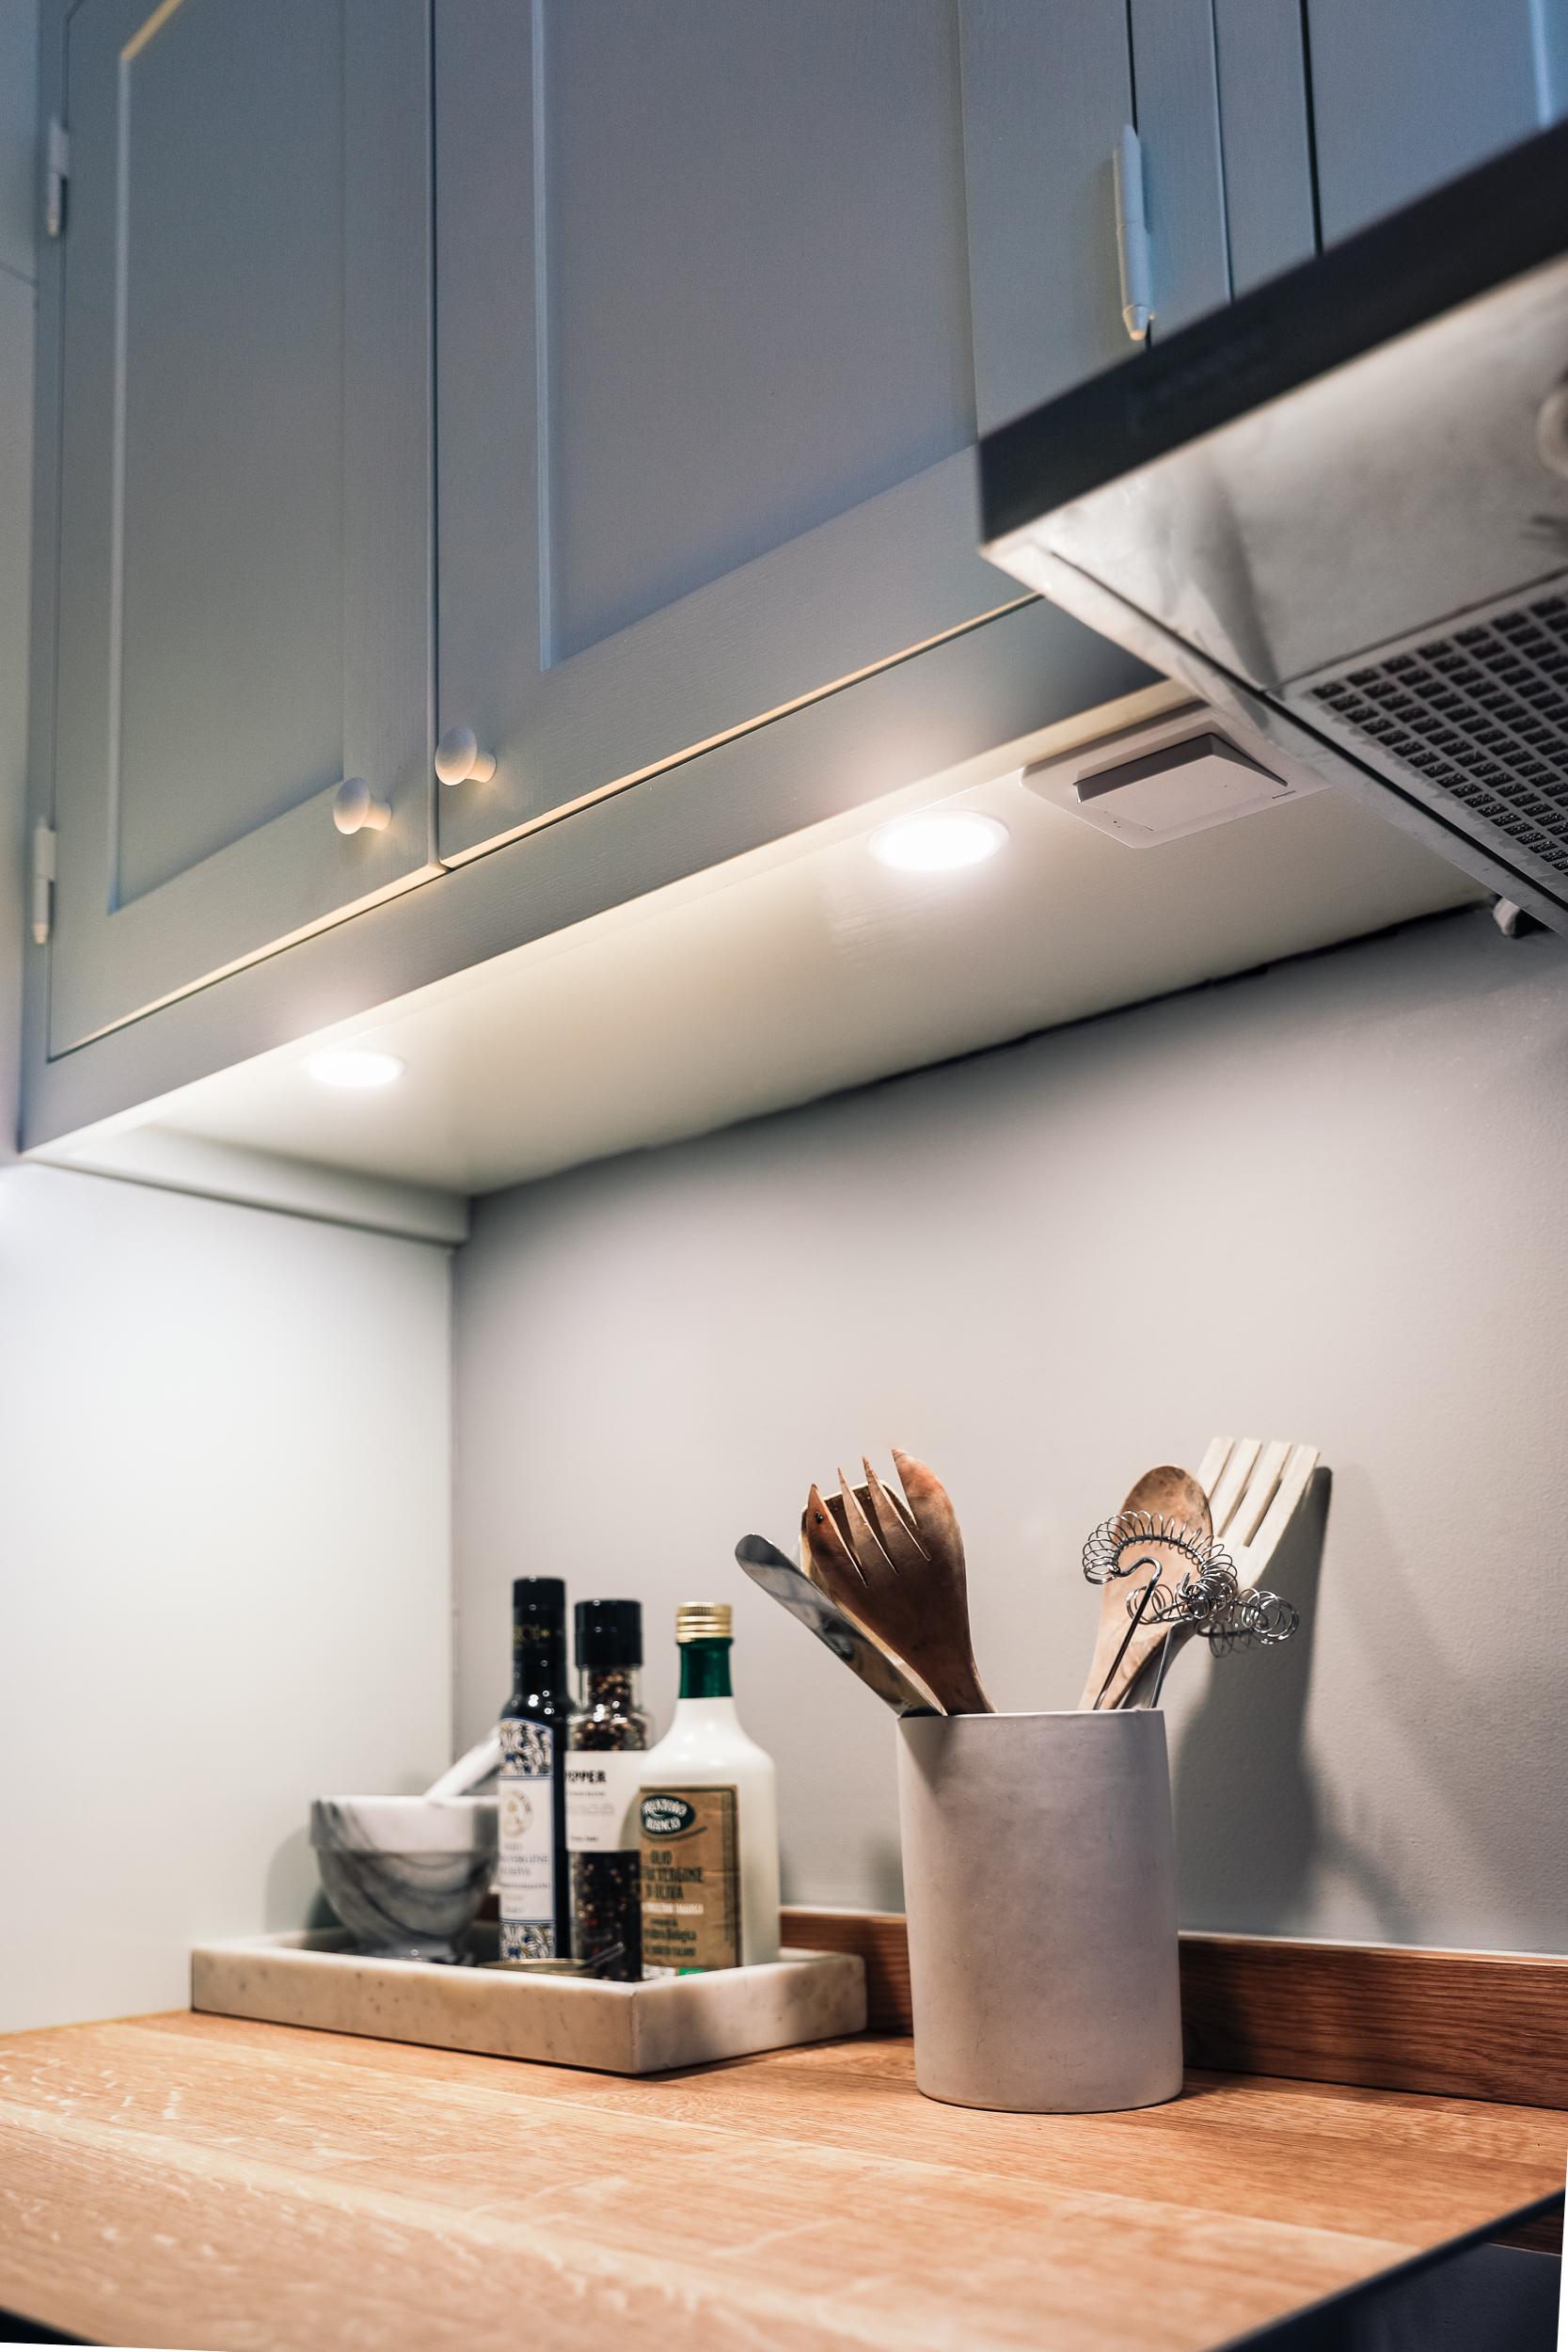 Spotlights under cabinet from Scandinavian Shaker Kitchen